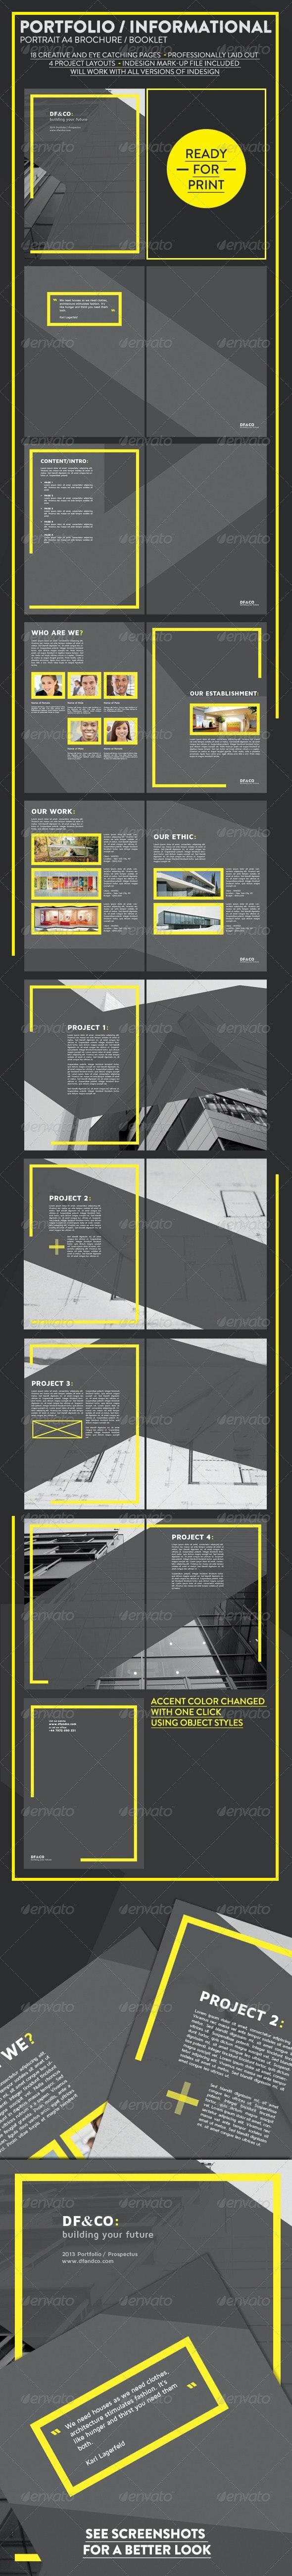 Modern Portfolio and Informational Brochure - Brochures Print Templates